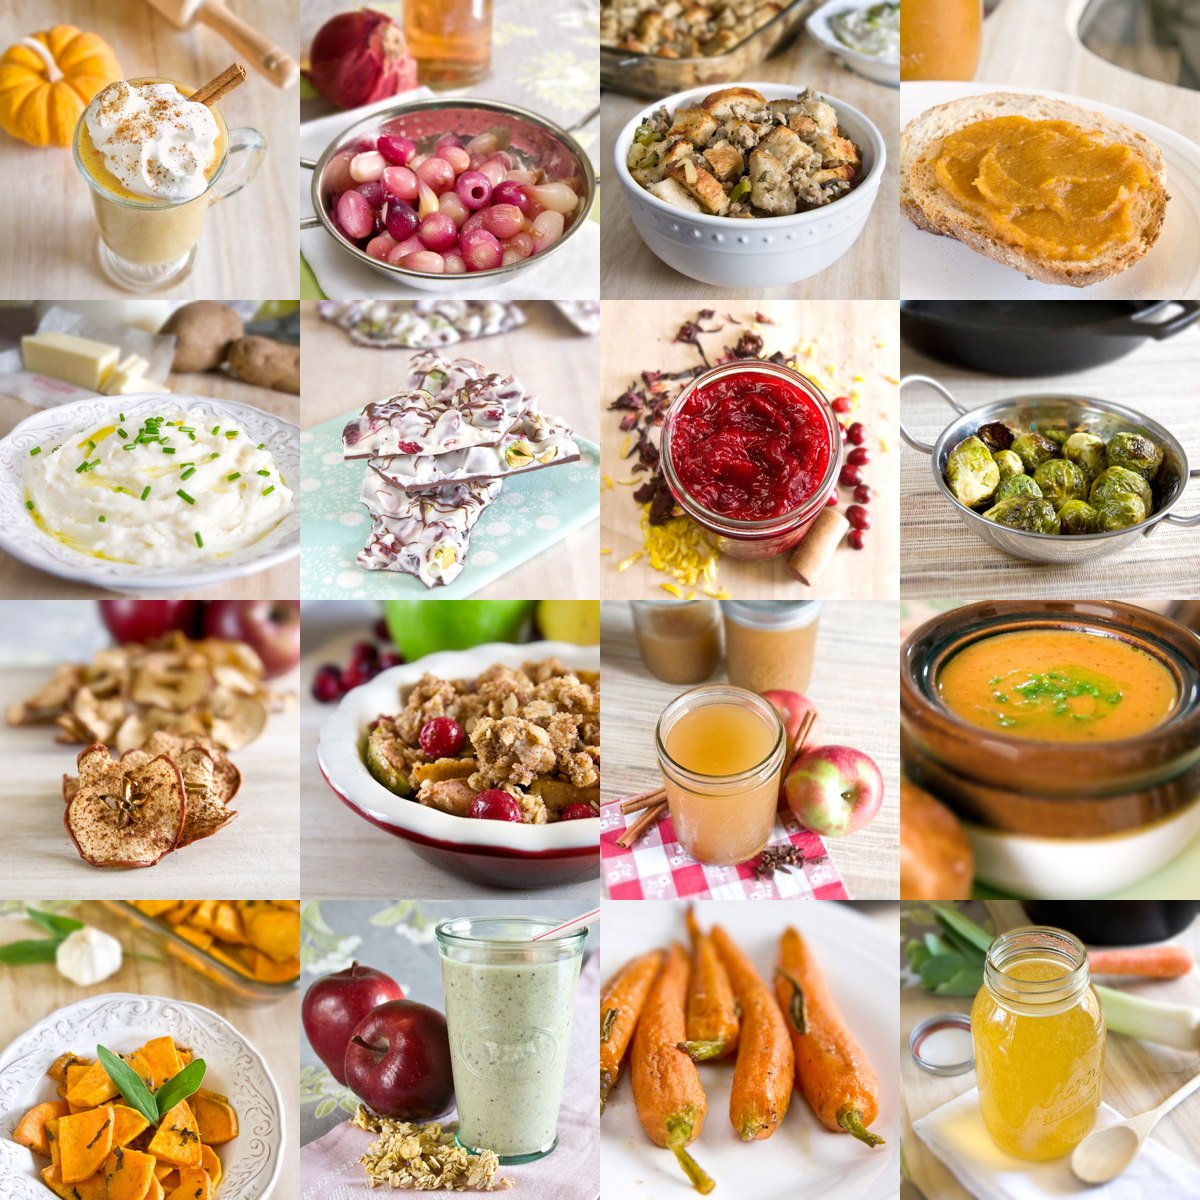 Jemma Samala: Send Me Your Favorite Thanksgiving Recipe